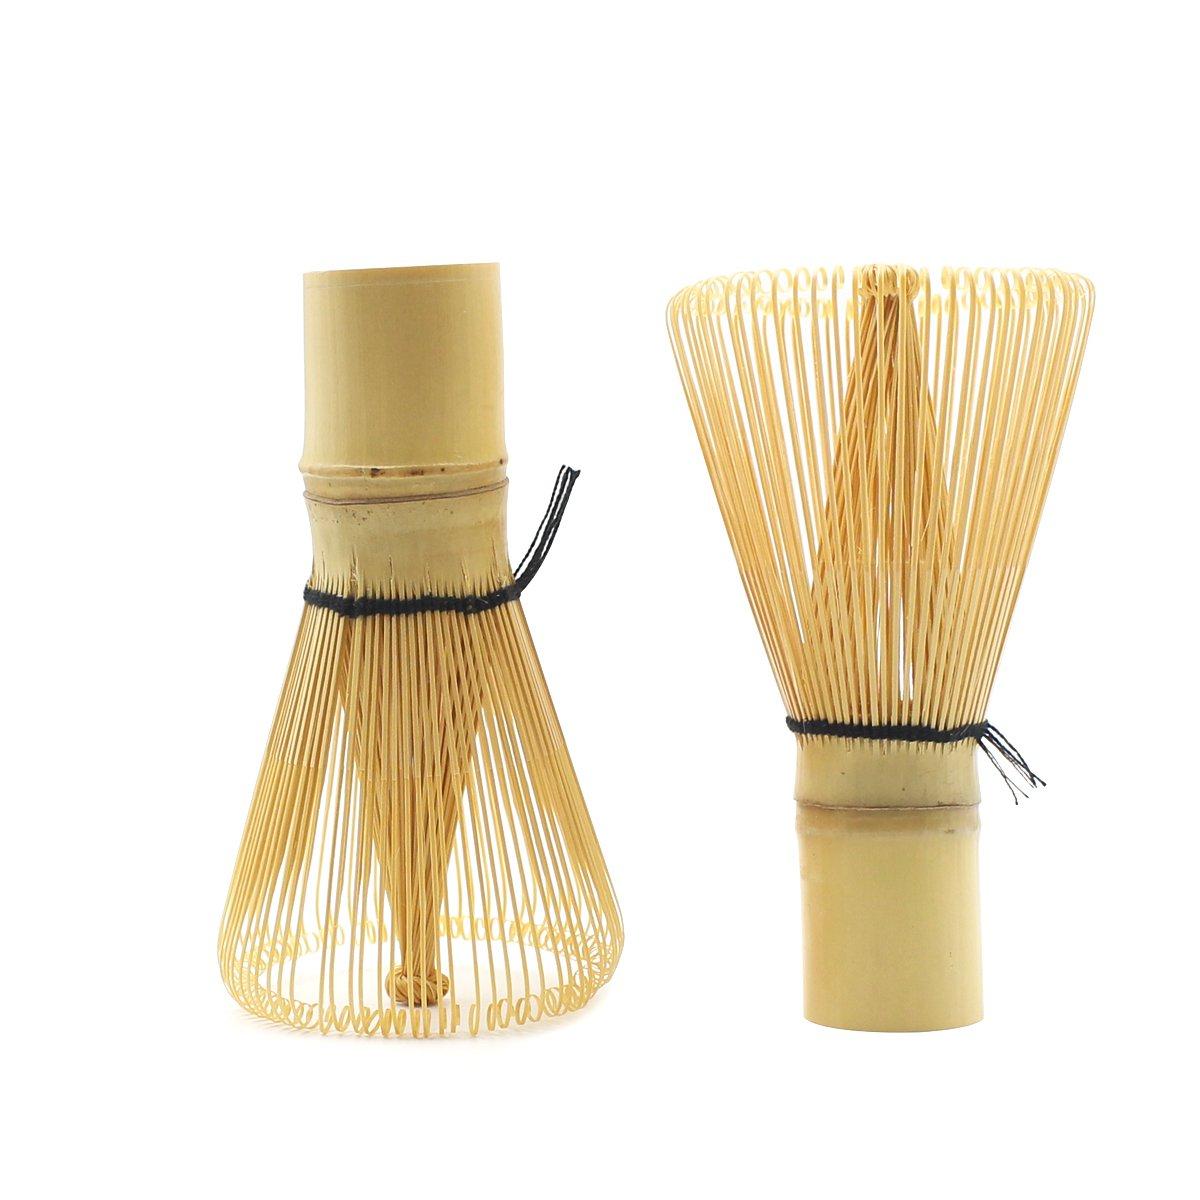 Qulable Bamboo Chasen Matcha Powder Whisk Tool Japanese Tea Ceremony Accessory 60-70 prongs